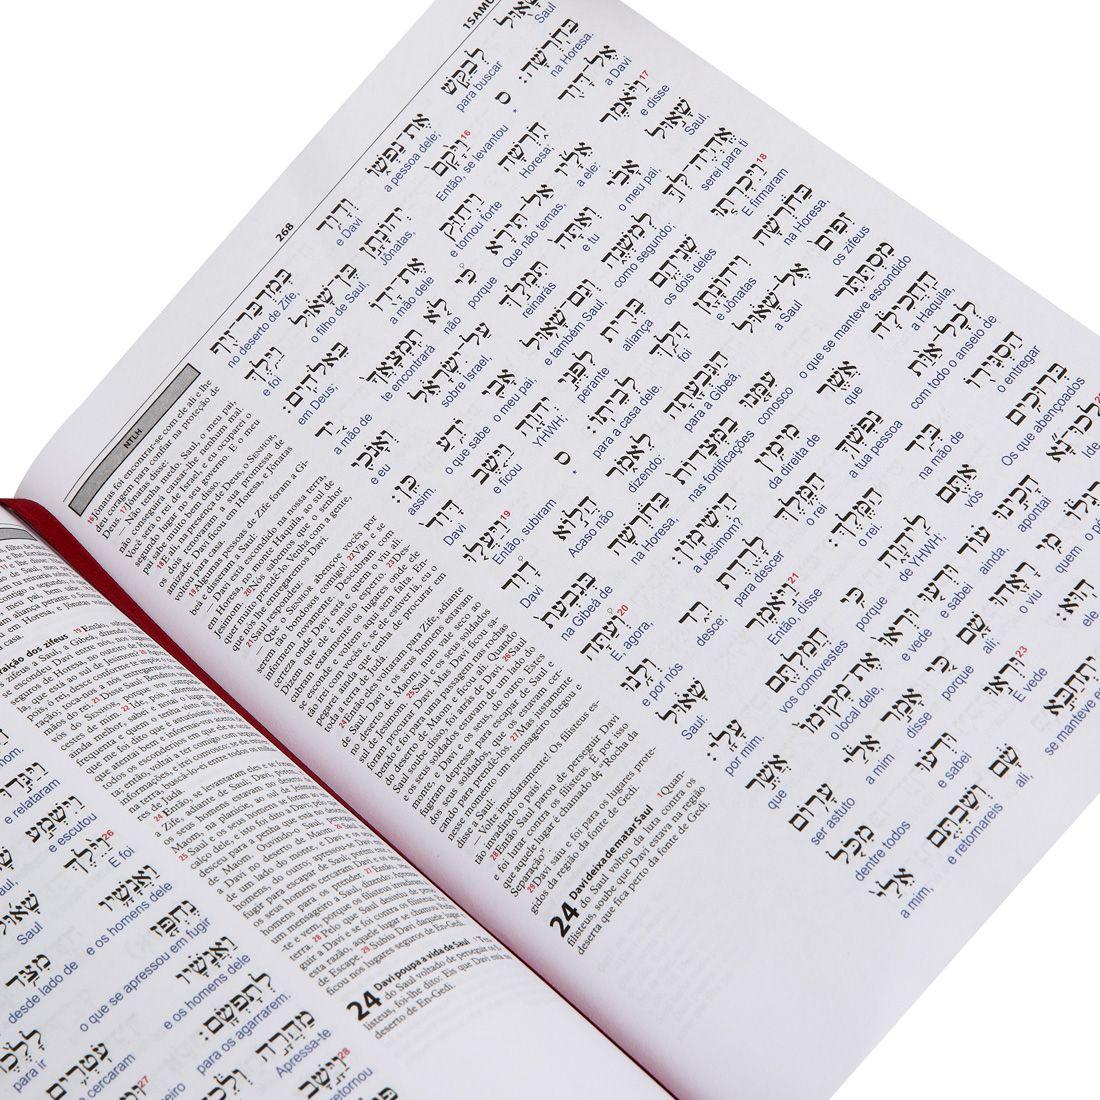 Antigo Testamento Interlinear Hebraico-Português Vol. 2 - Profetas Anteriores